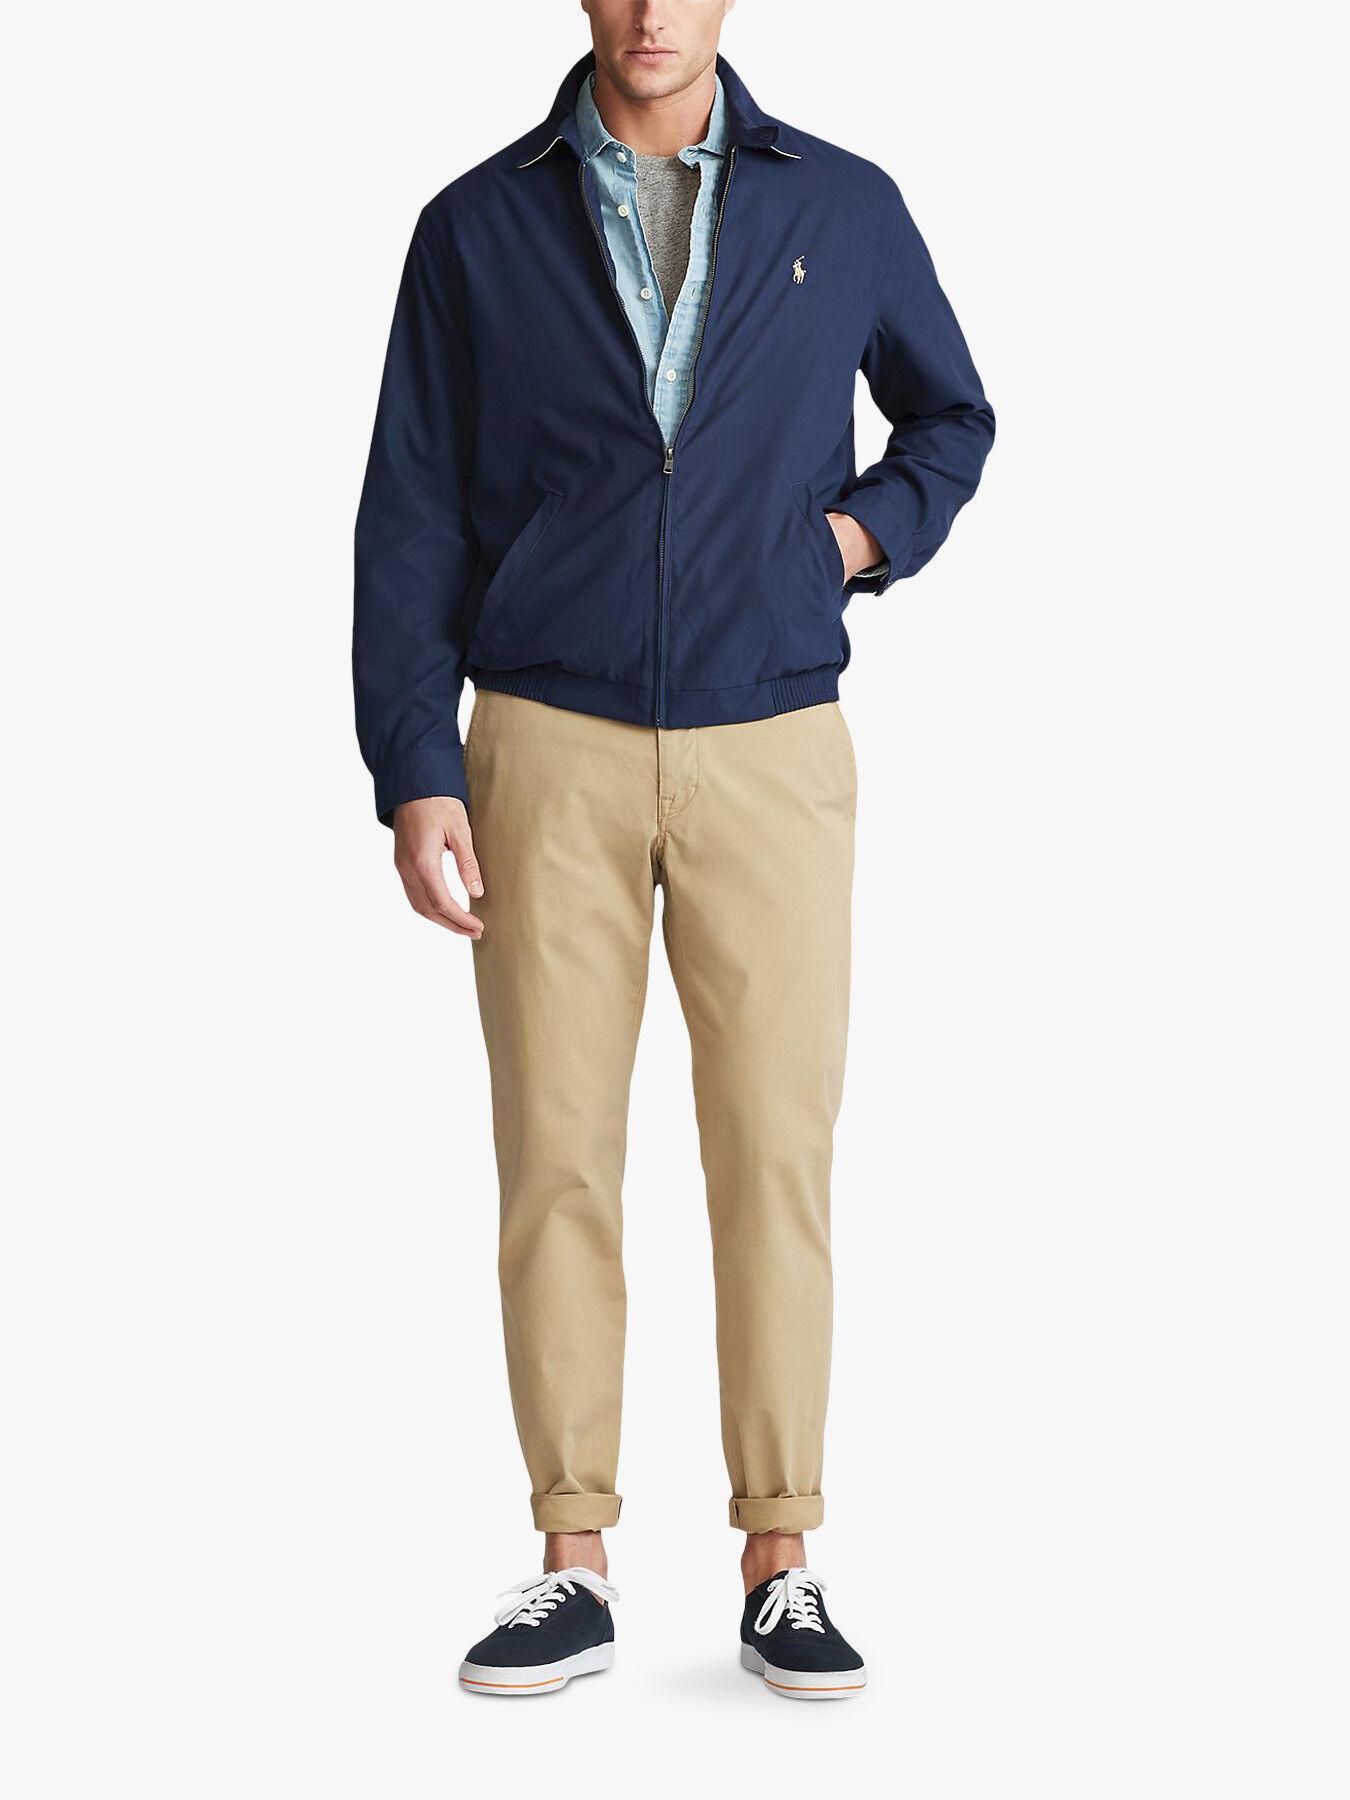 Men's Coats & Jackets | Harrods